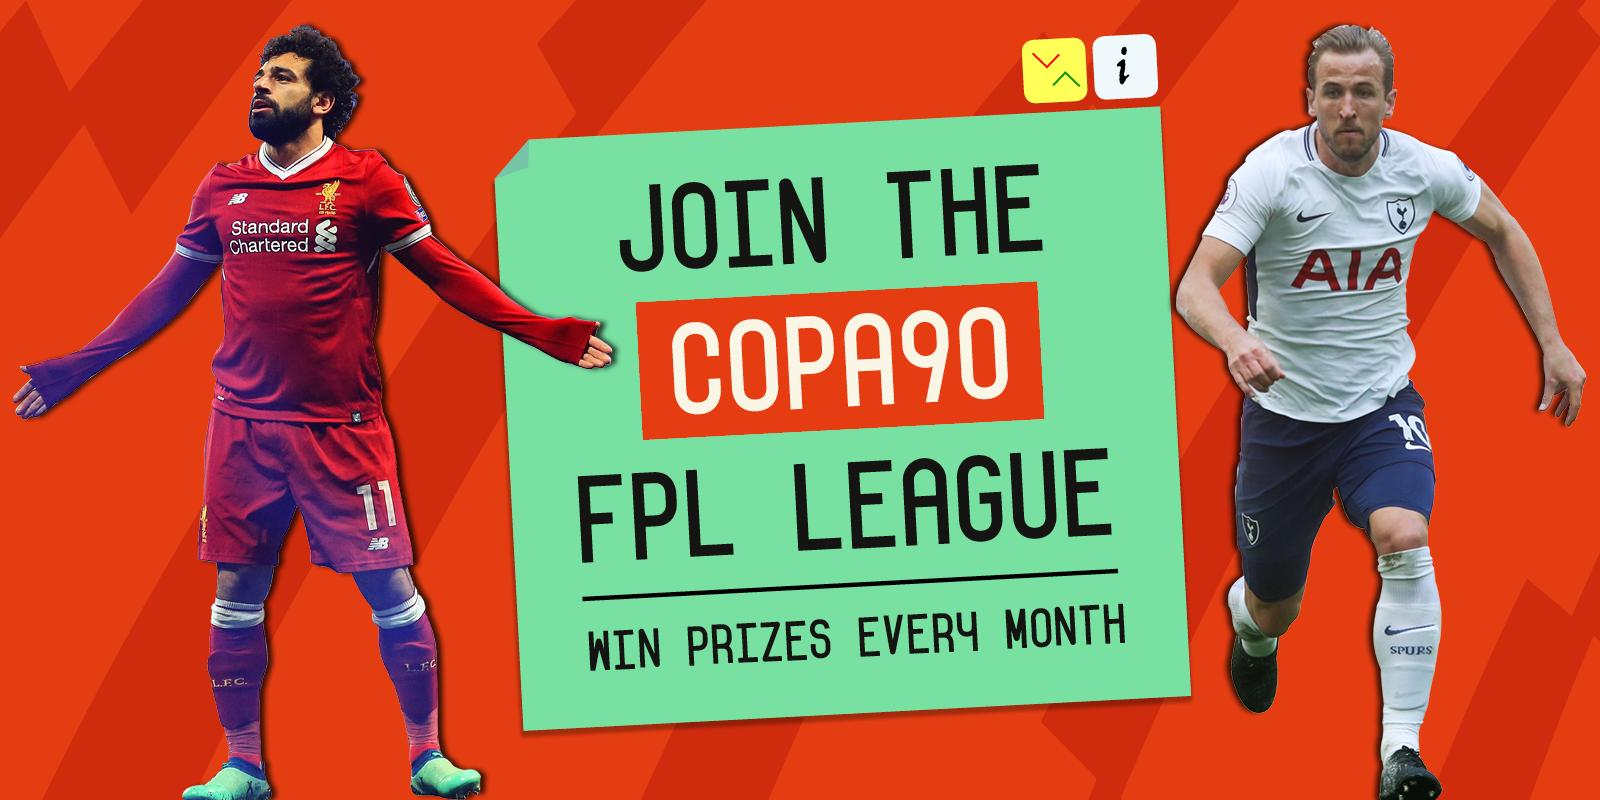 Enter the COPA90 FPL League!